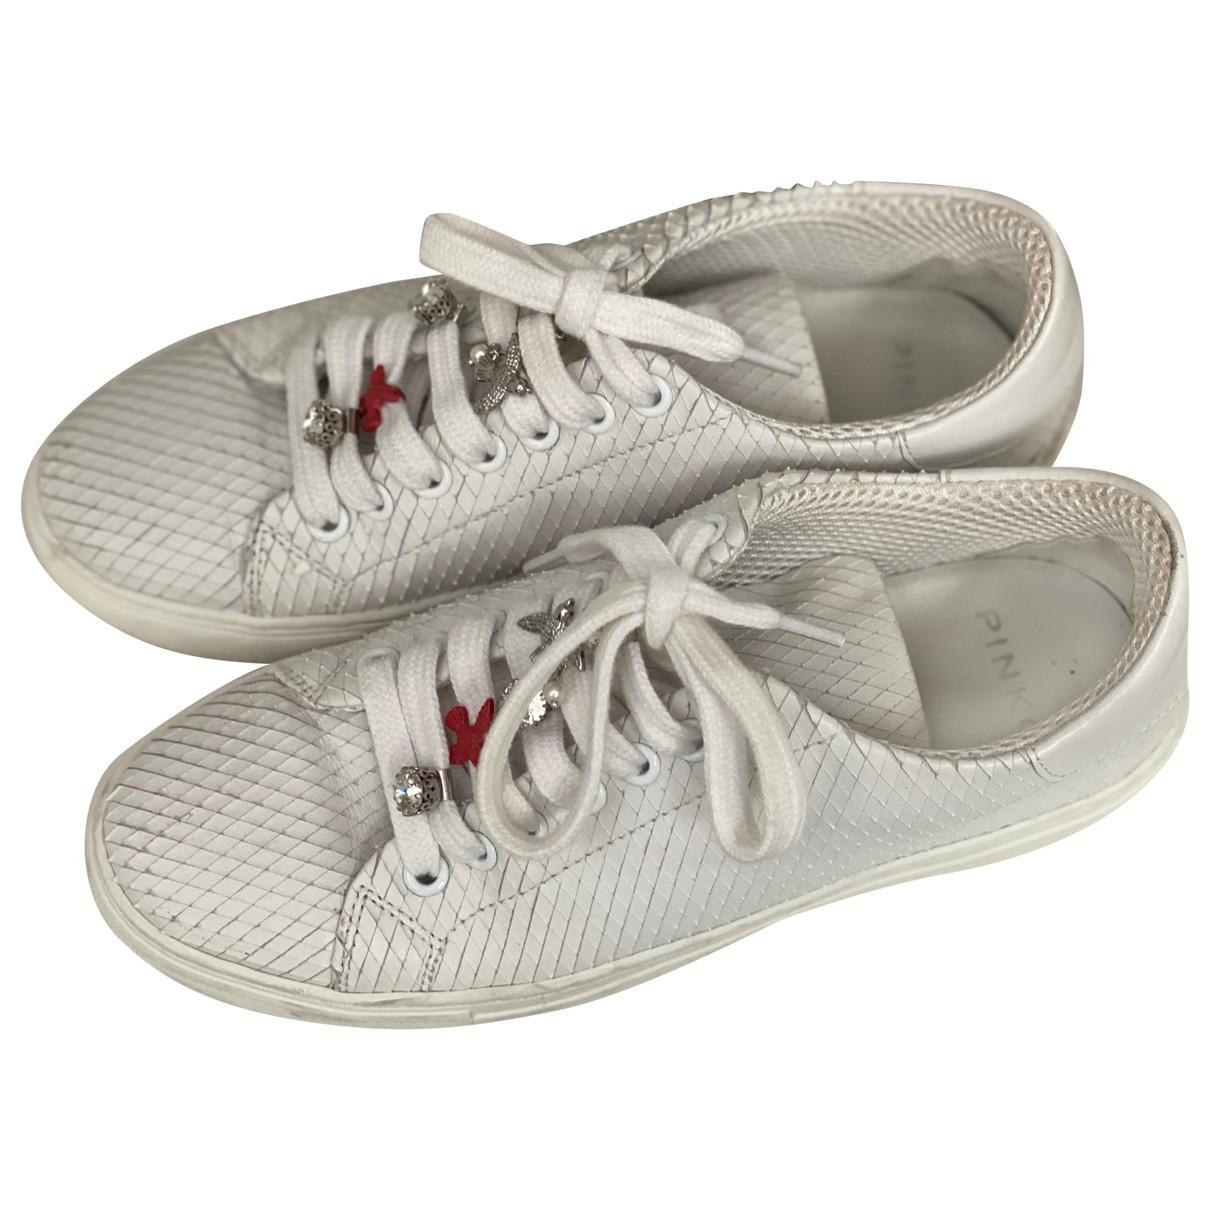 Pinko \N Sneakers in  Weiss Exotenleder